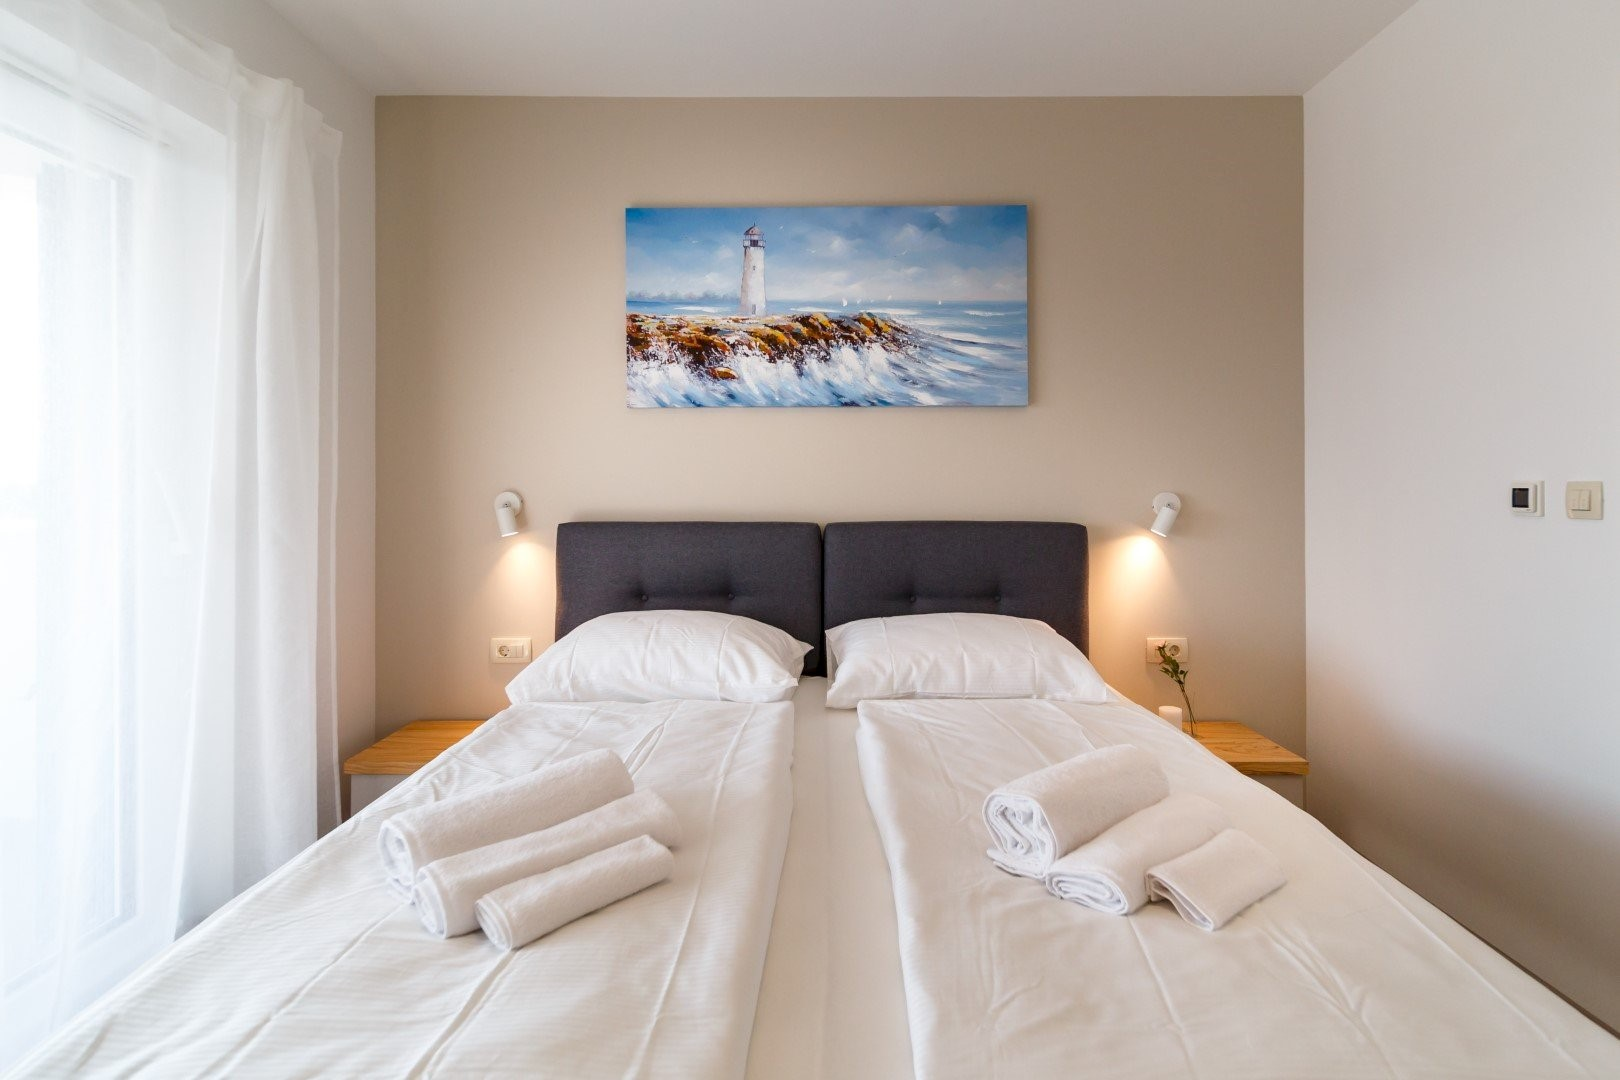 Ferienhaus Luxury Villa Loma 1 (2586644), Sveti Vid-Miholjice, Insel Krk, Kvarner, Kroatien, Bild 17